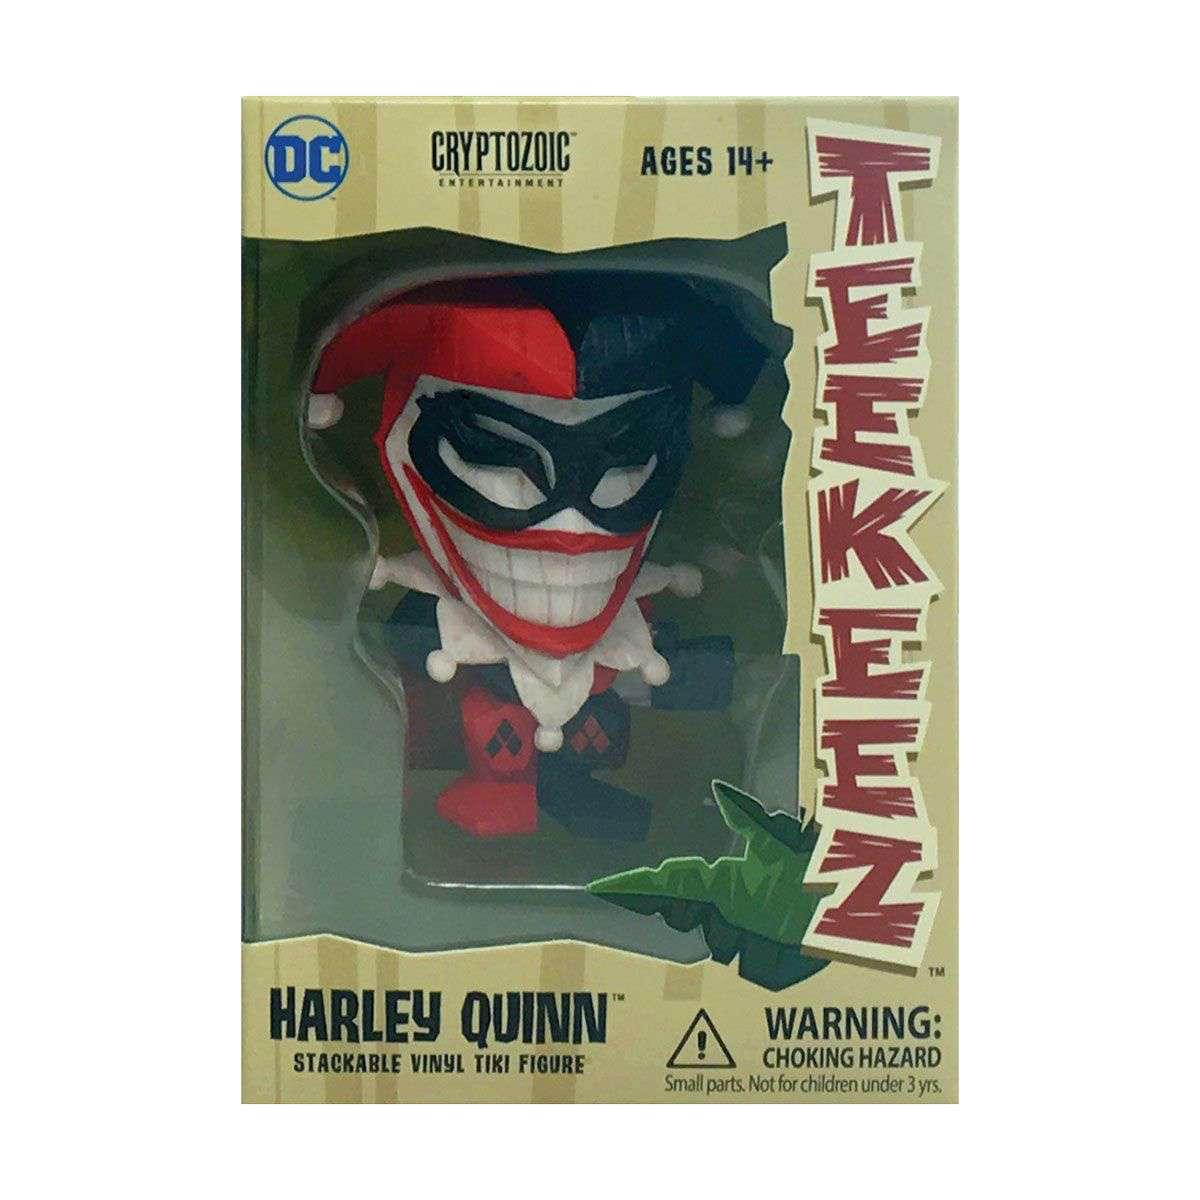 HARLEY QUINN TEEKEEZ DC COMICS - CRYPTOZOIC